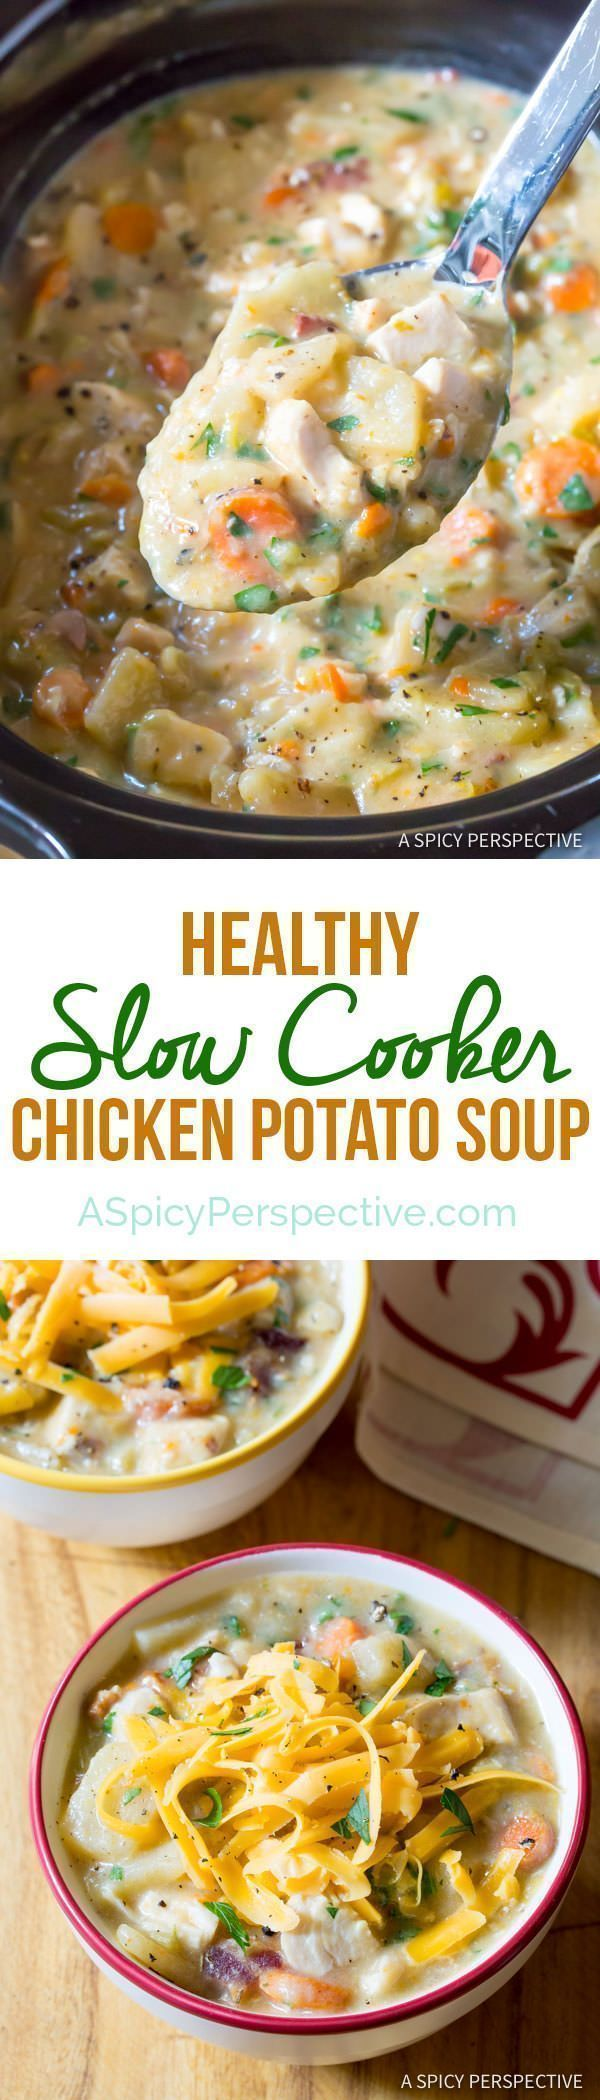 Amazing Healthy Slow Cooker Chicken Potato Soup   http://ASpicyPerspective.com